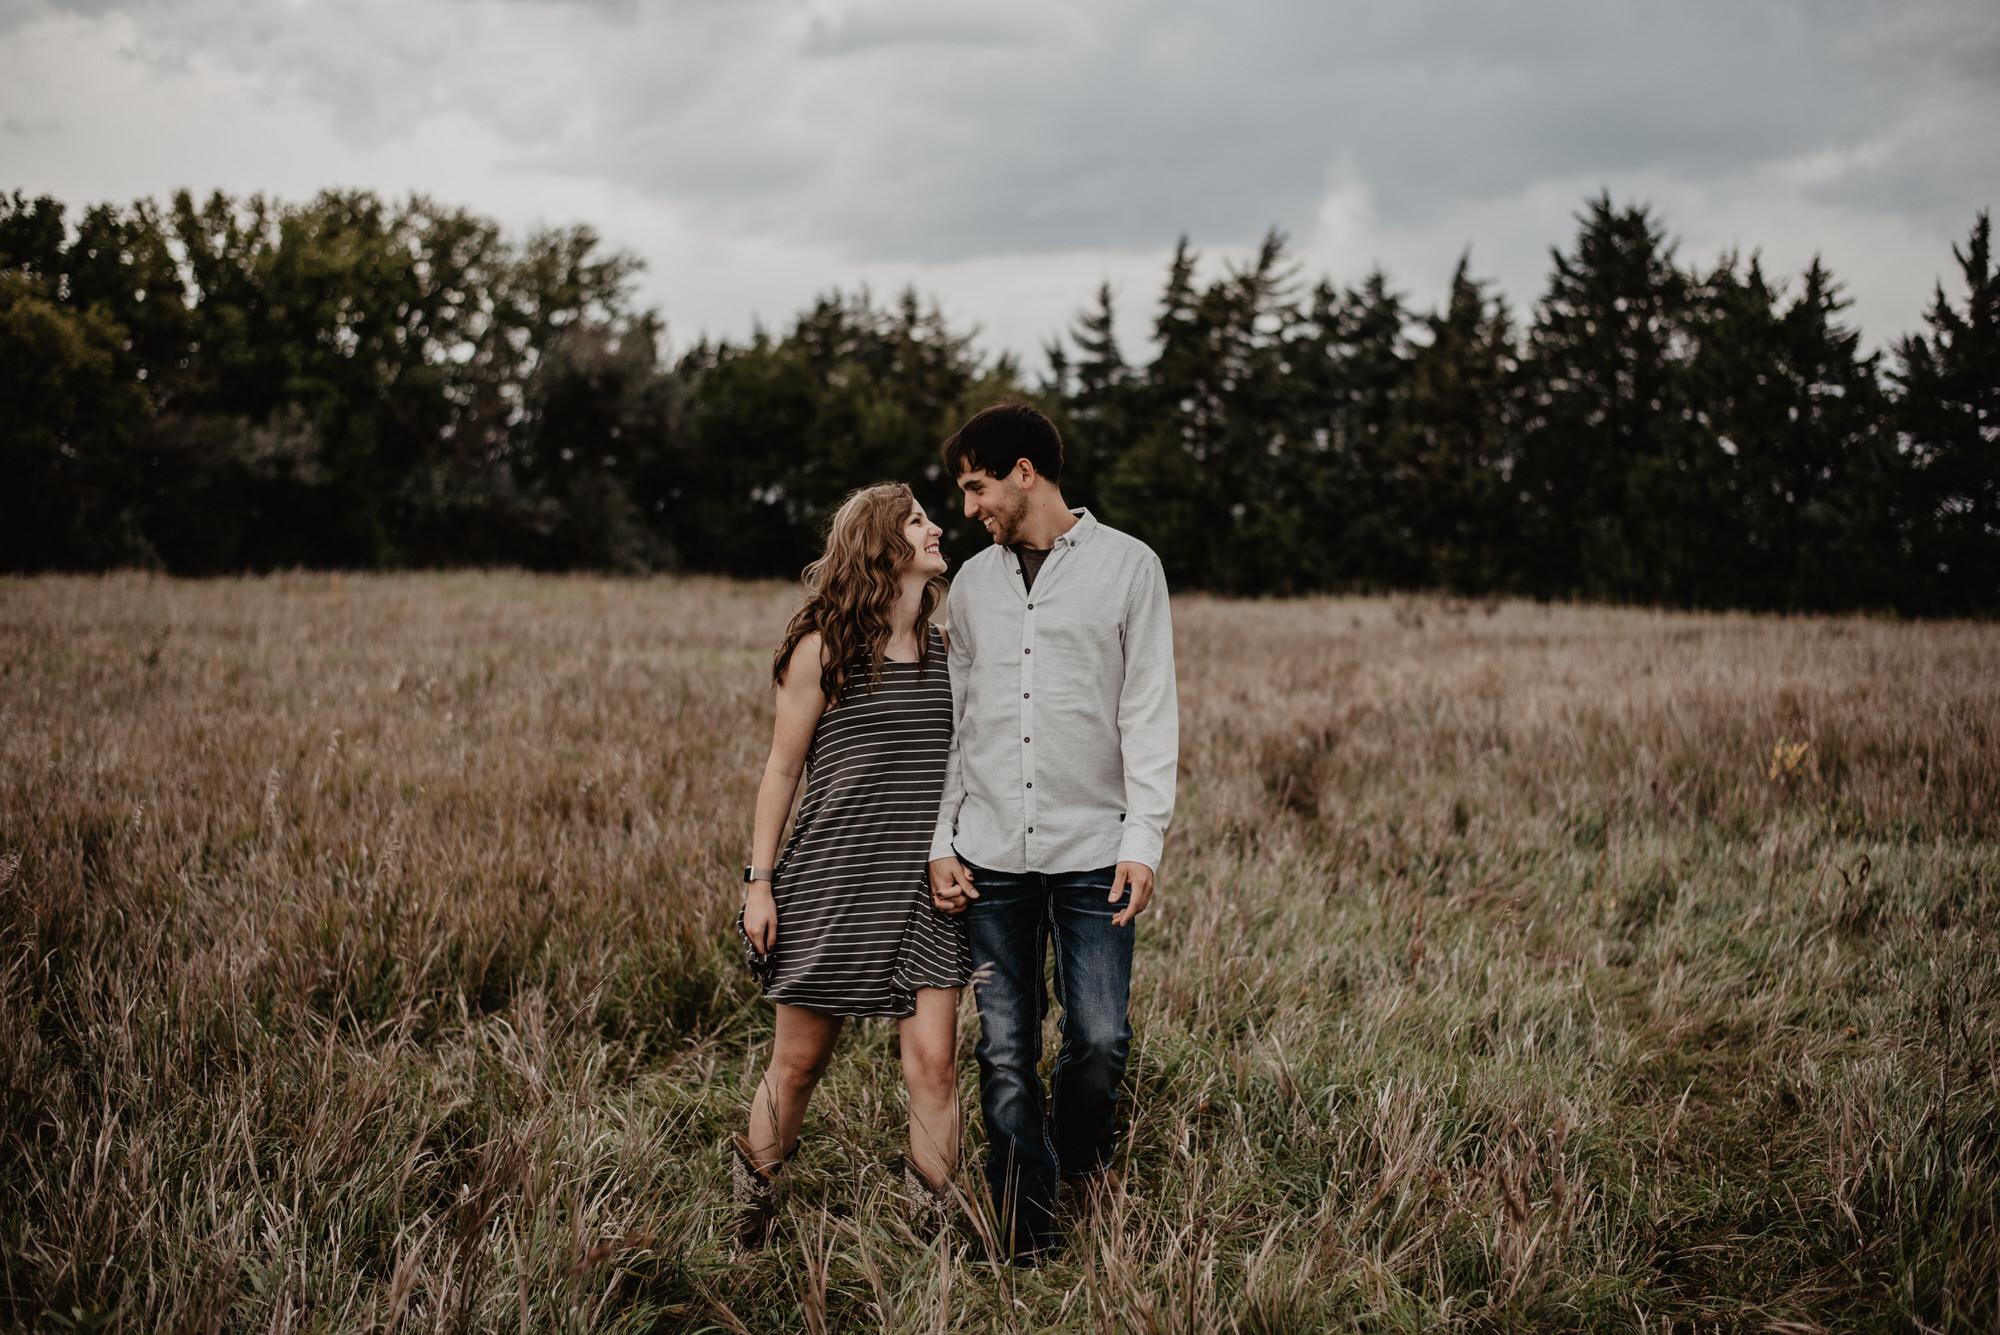 Kaylie-Sirek-Photography-wedding-engagement-photographer-Grand-Island-Kearney-Hastings-Lincoln-Nebraska-central-midwest-moments-trump-posing-natural-light-engaged-07.jpg